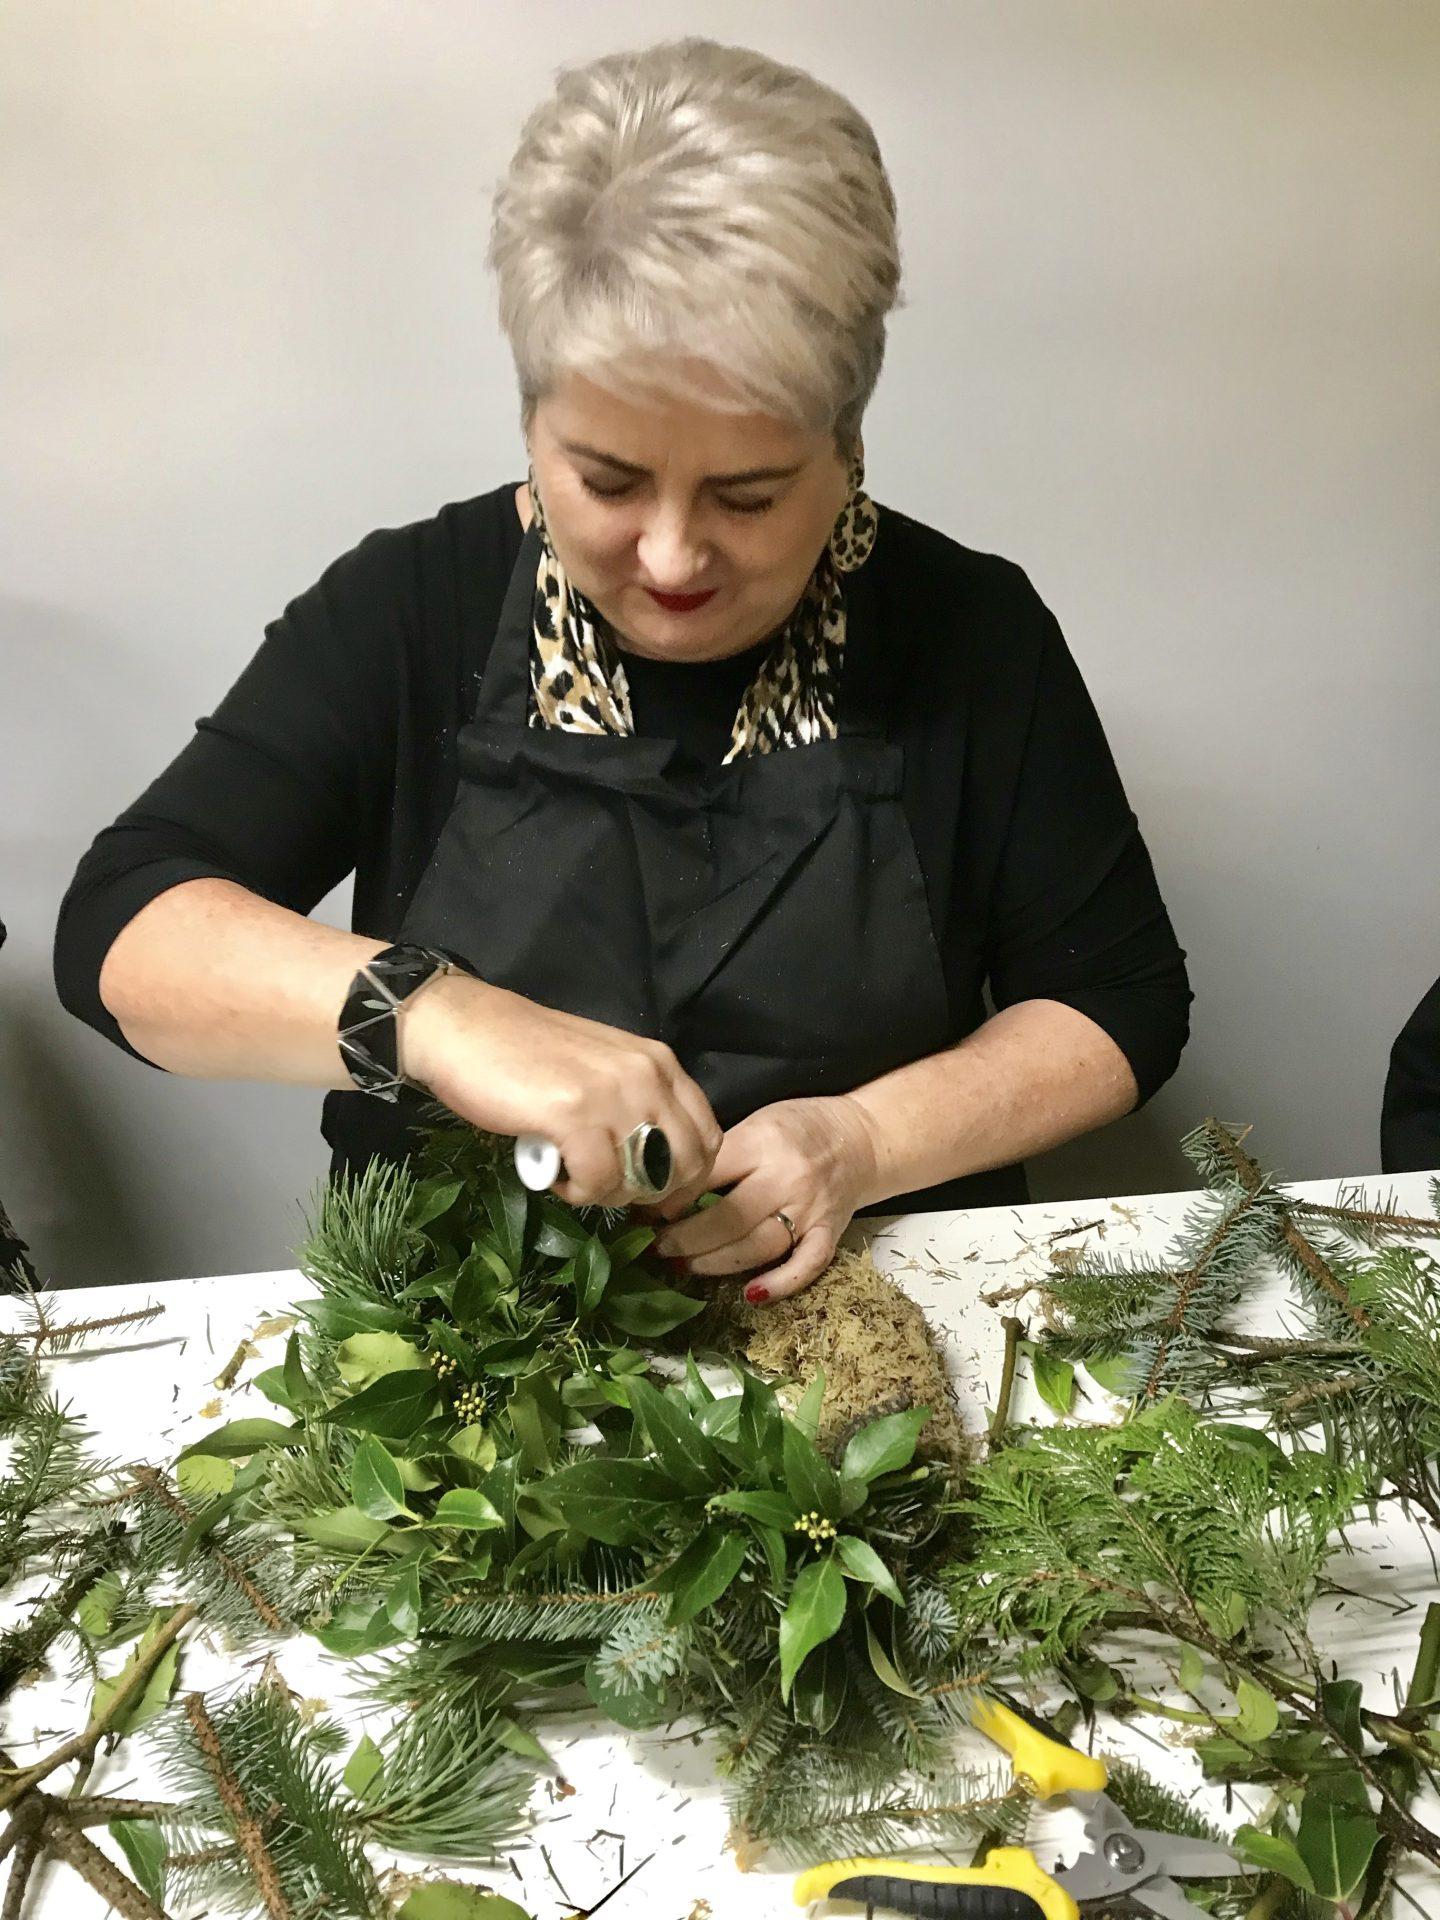 How _To Make A Christmas Wreath